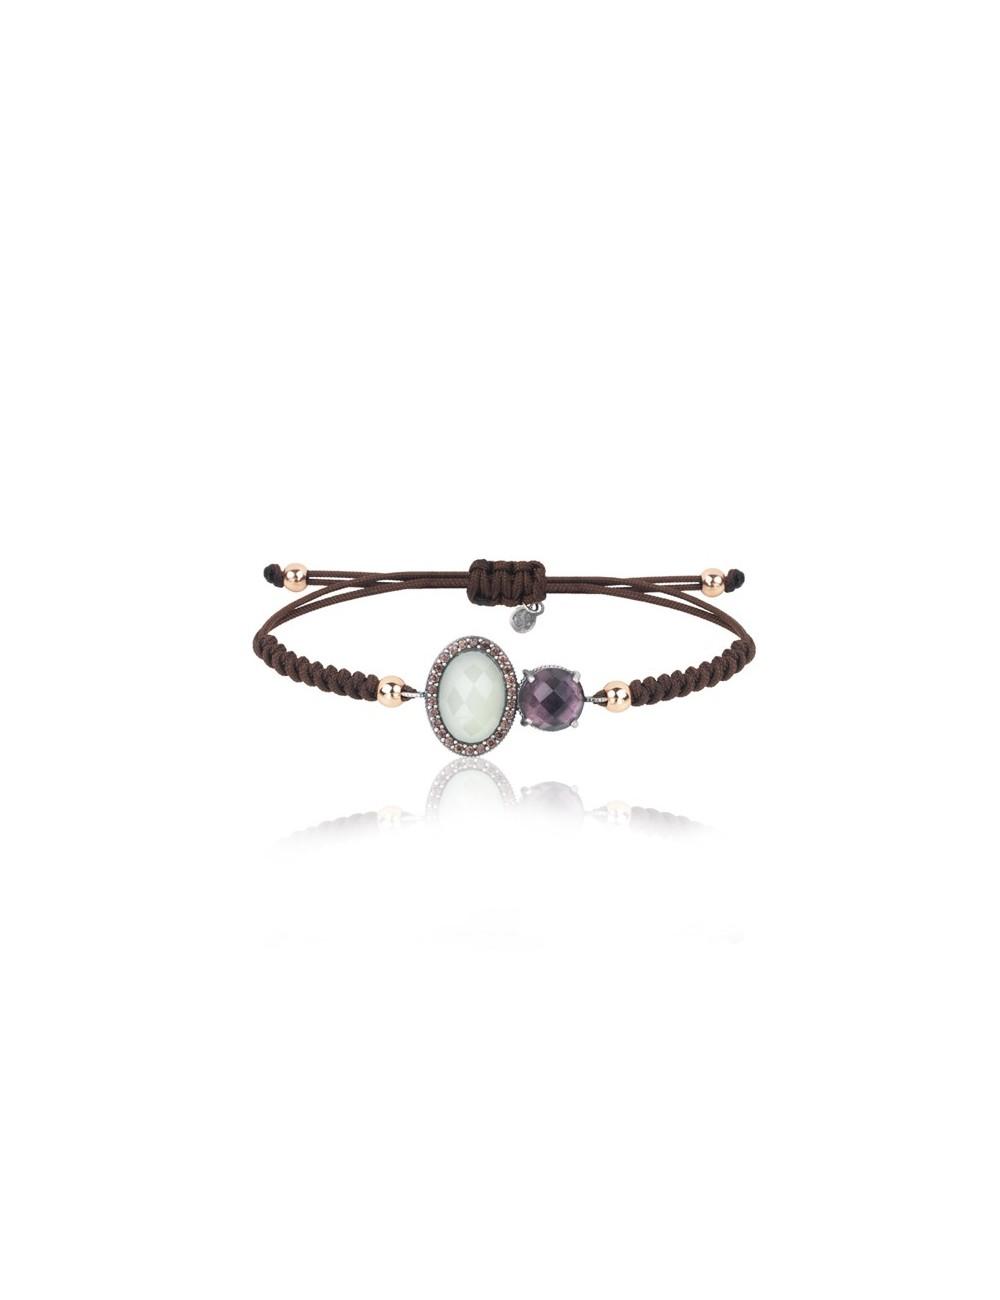 Sunfield -Pulsera Sunfield plata, turmalina rosa, calcedonia, circonitas y nailon -PU062507